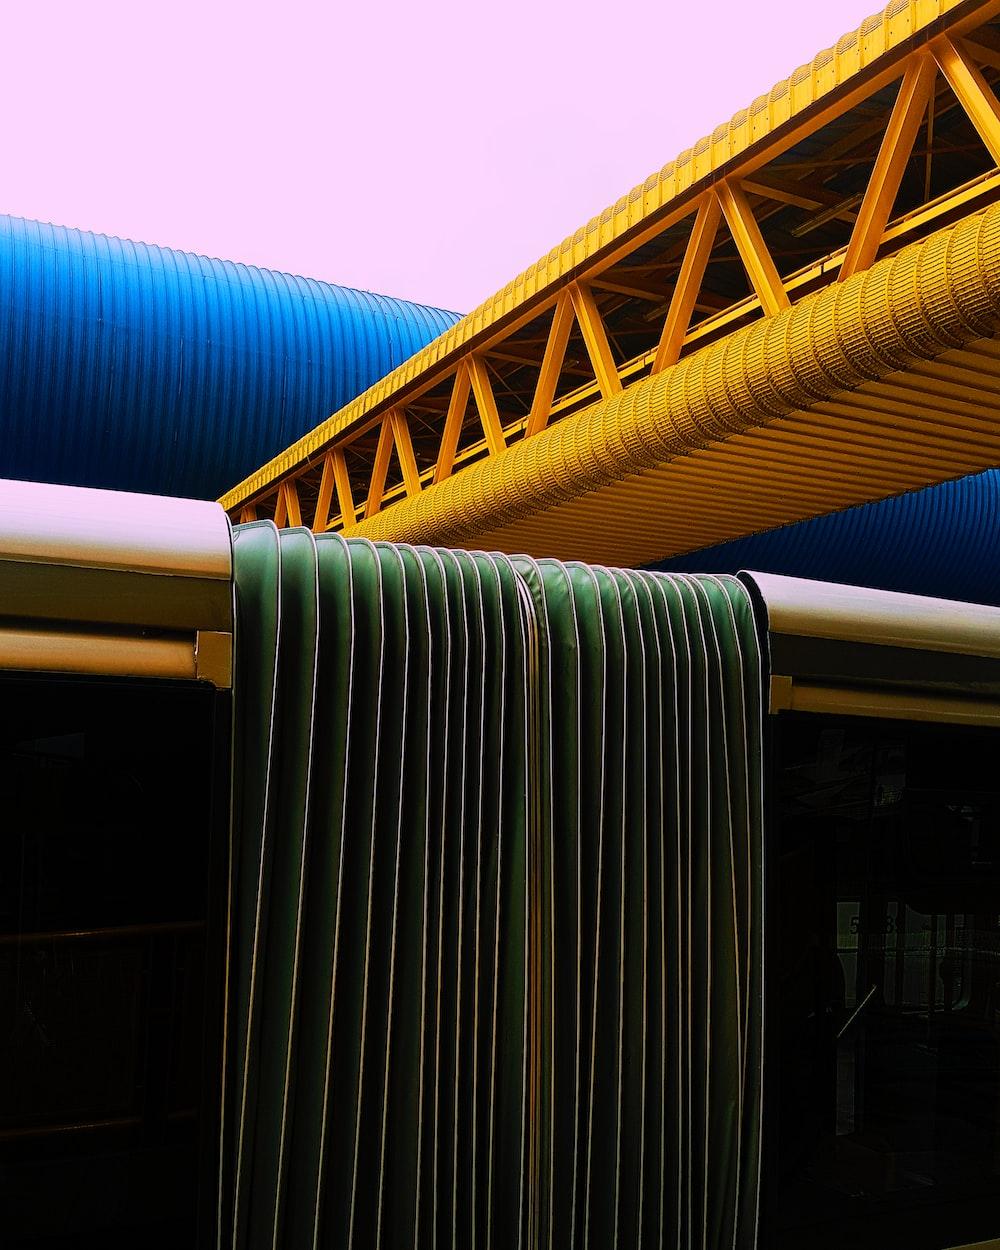 yellow foot bridge